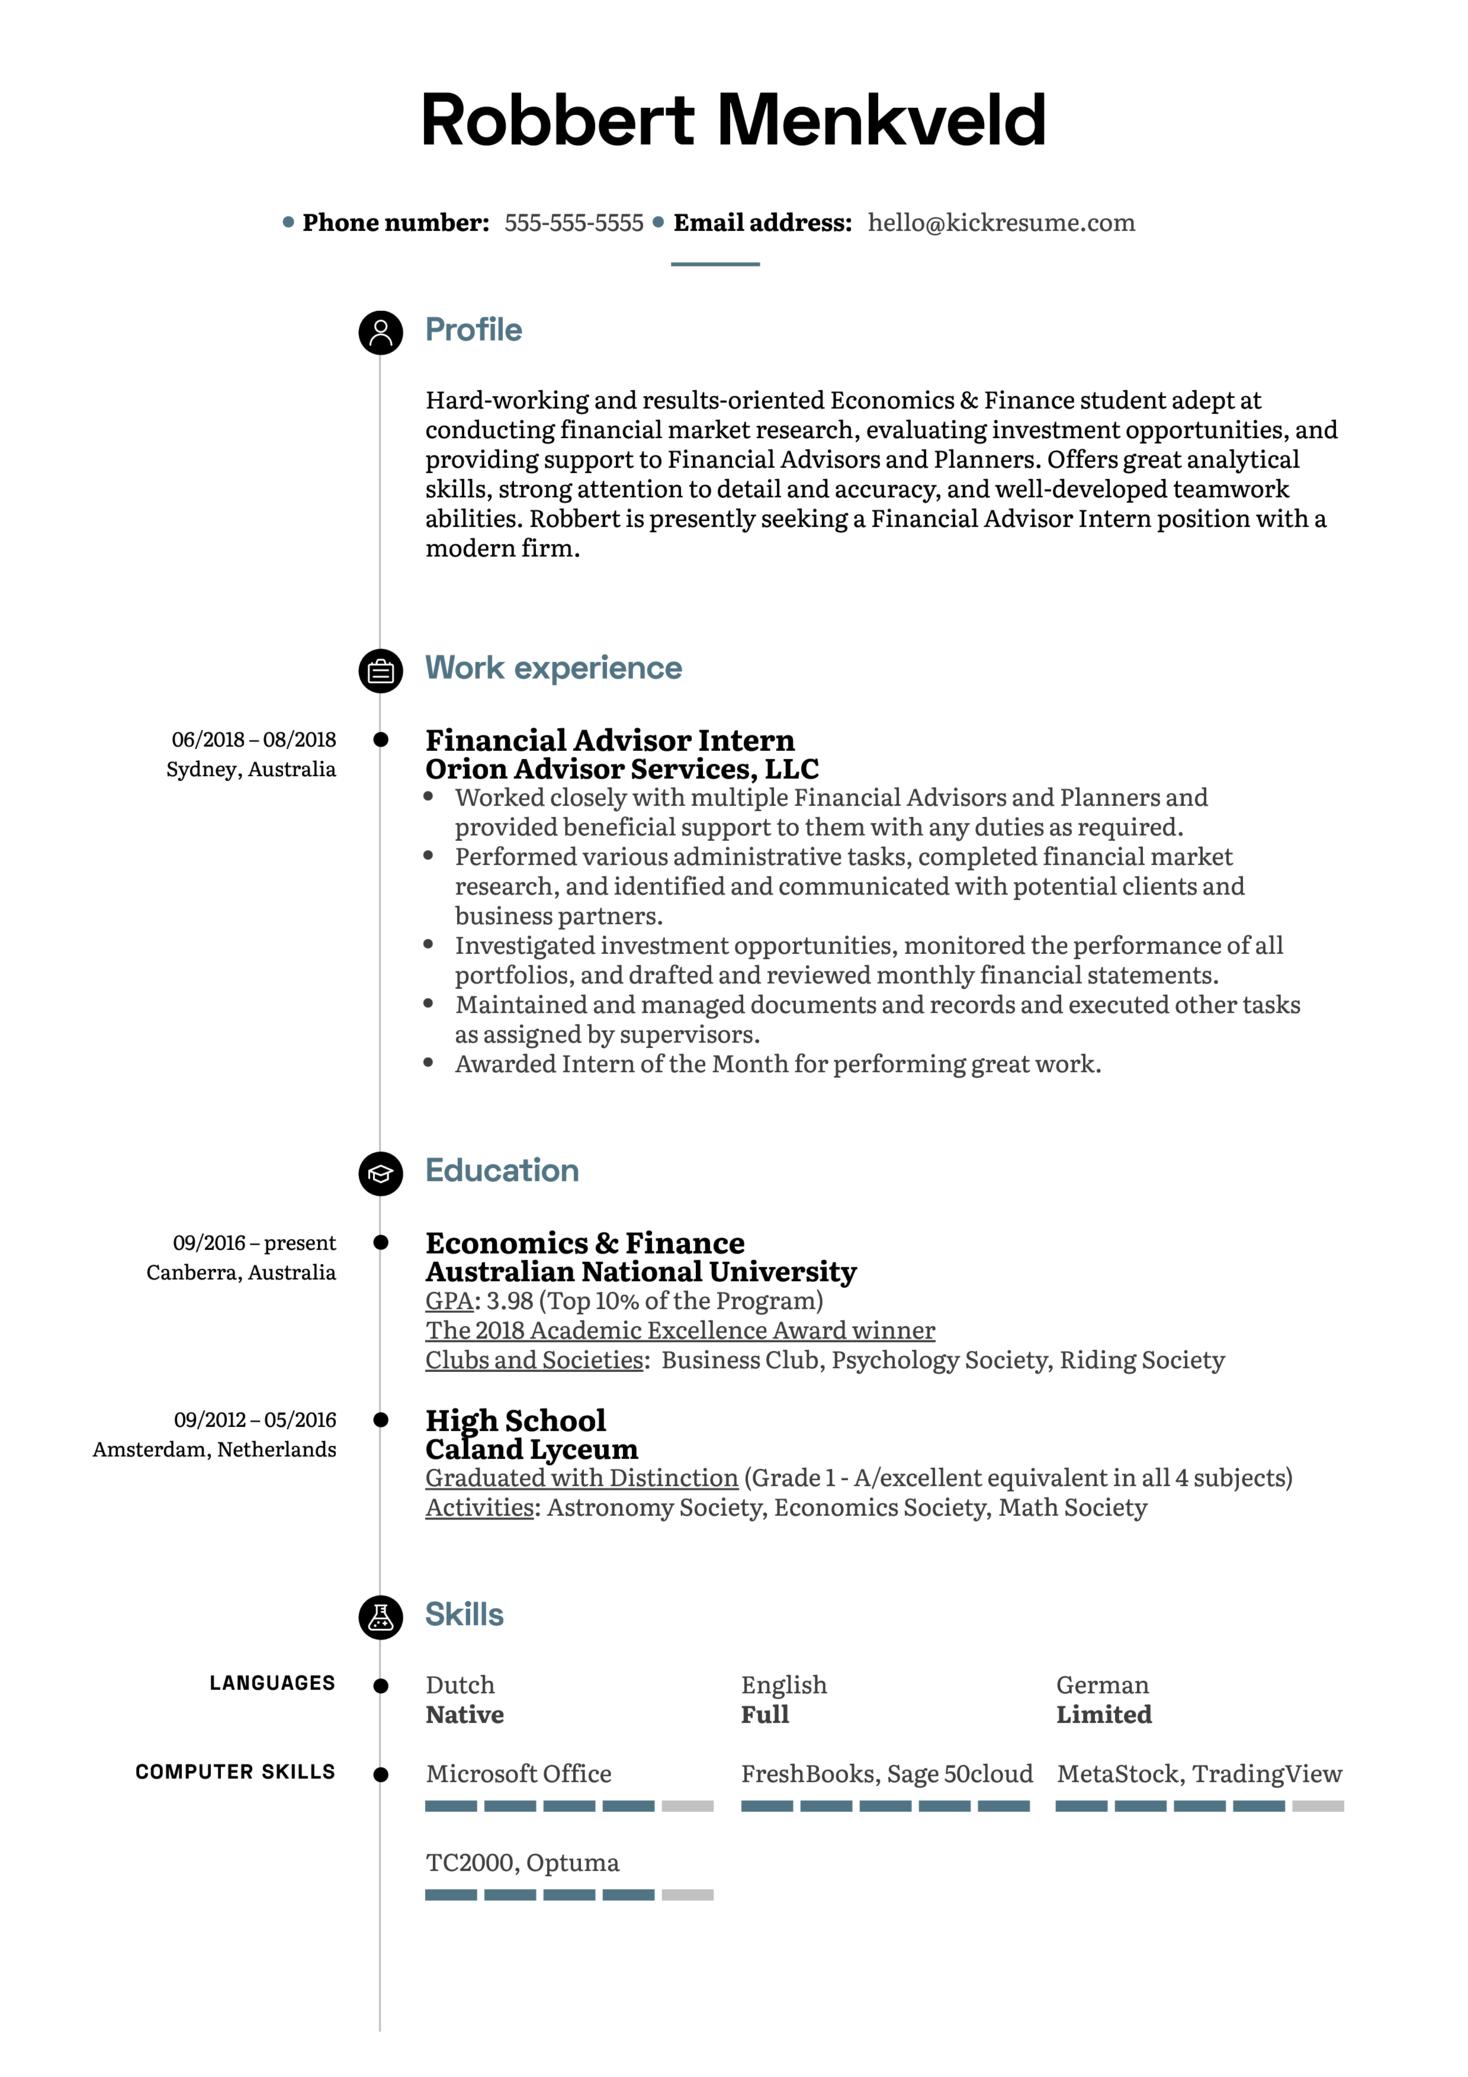 Financial Advisor Intern Resume Example (Teil 1)